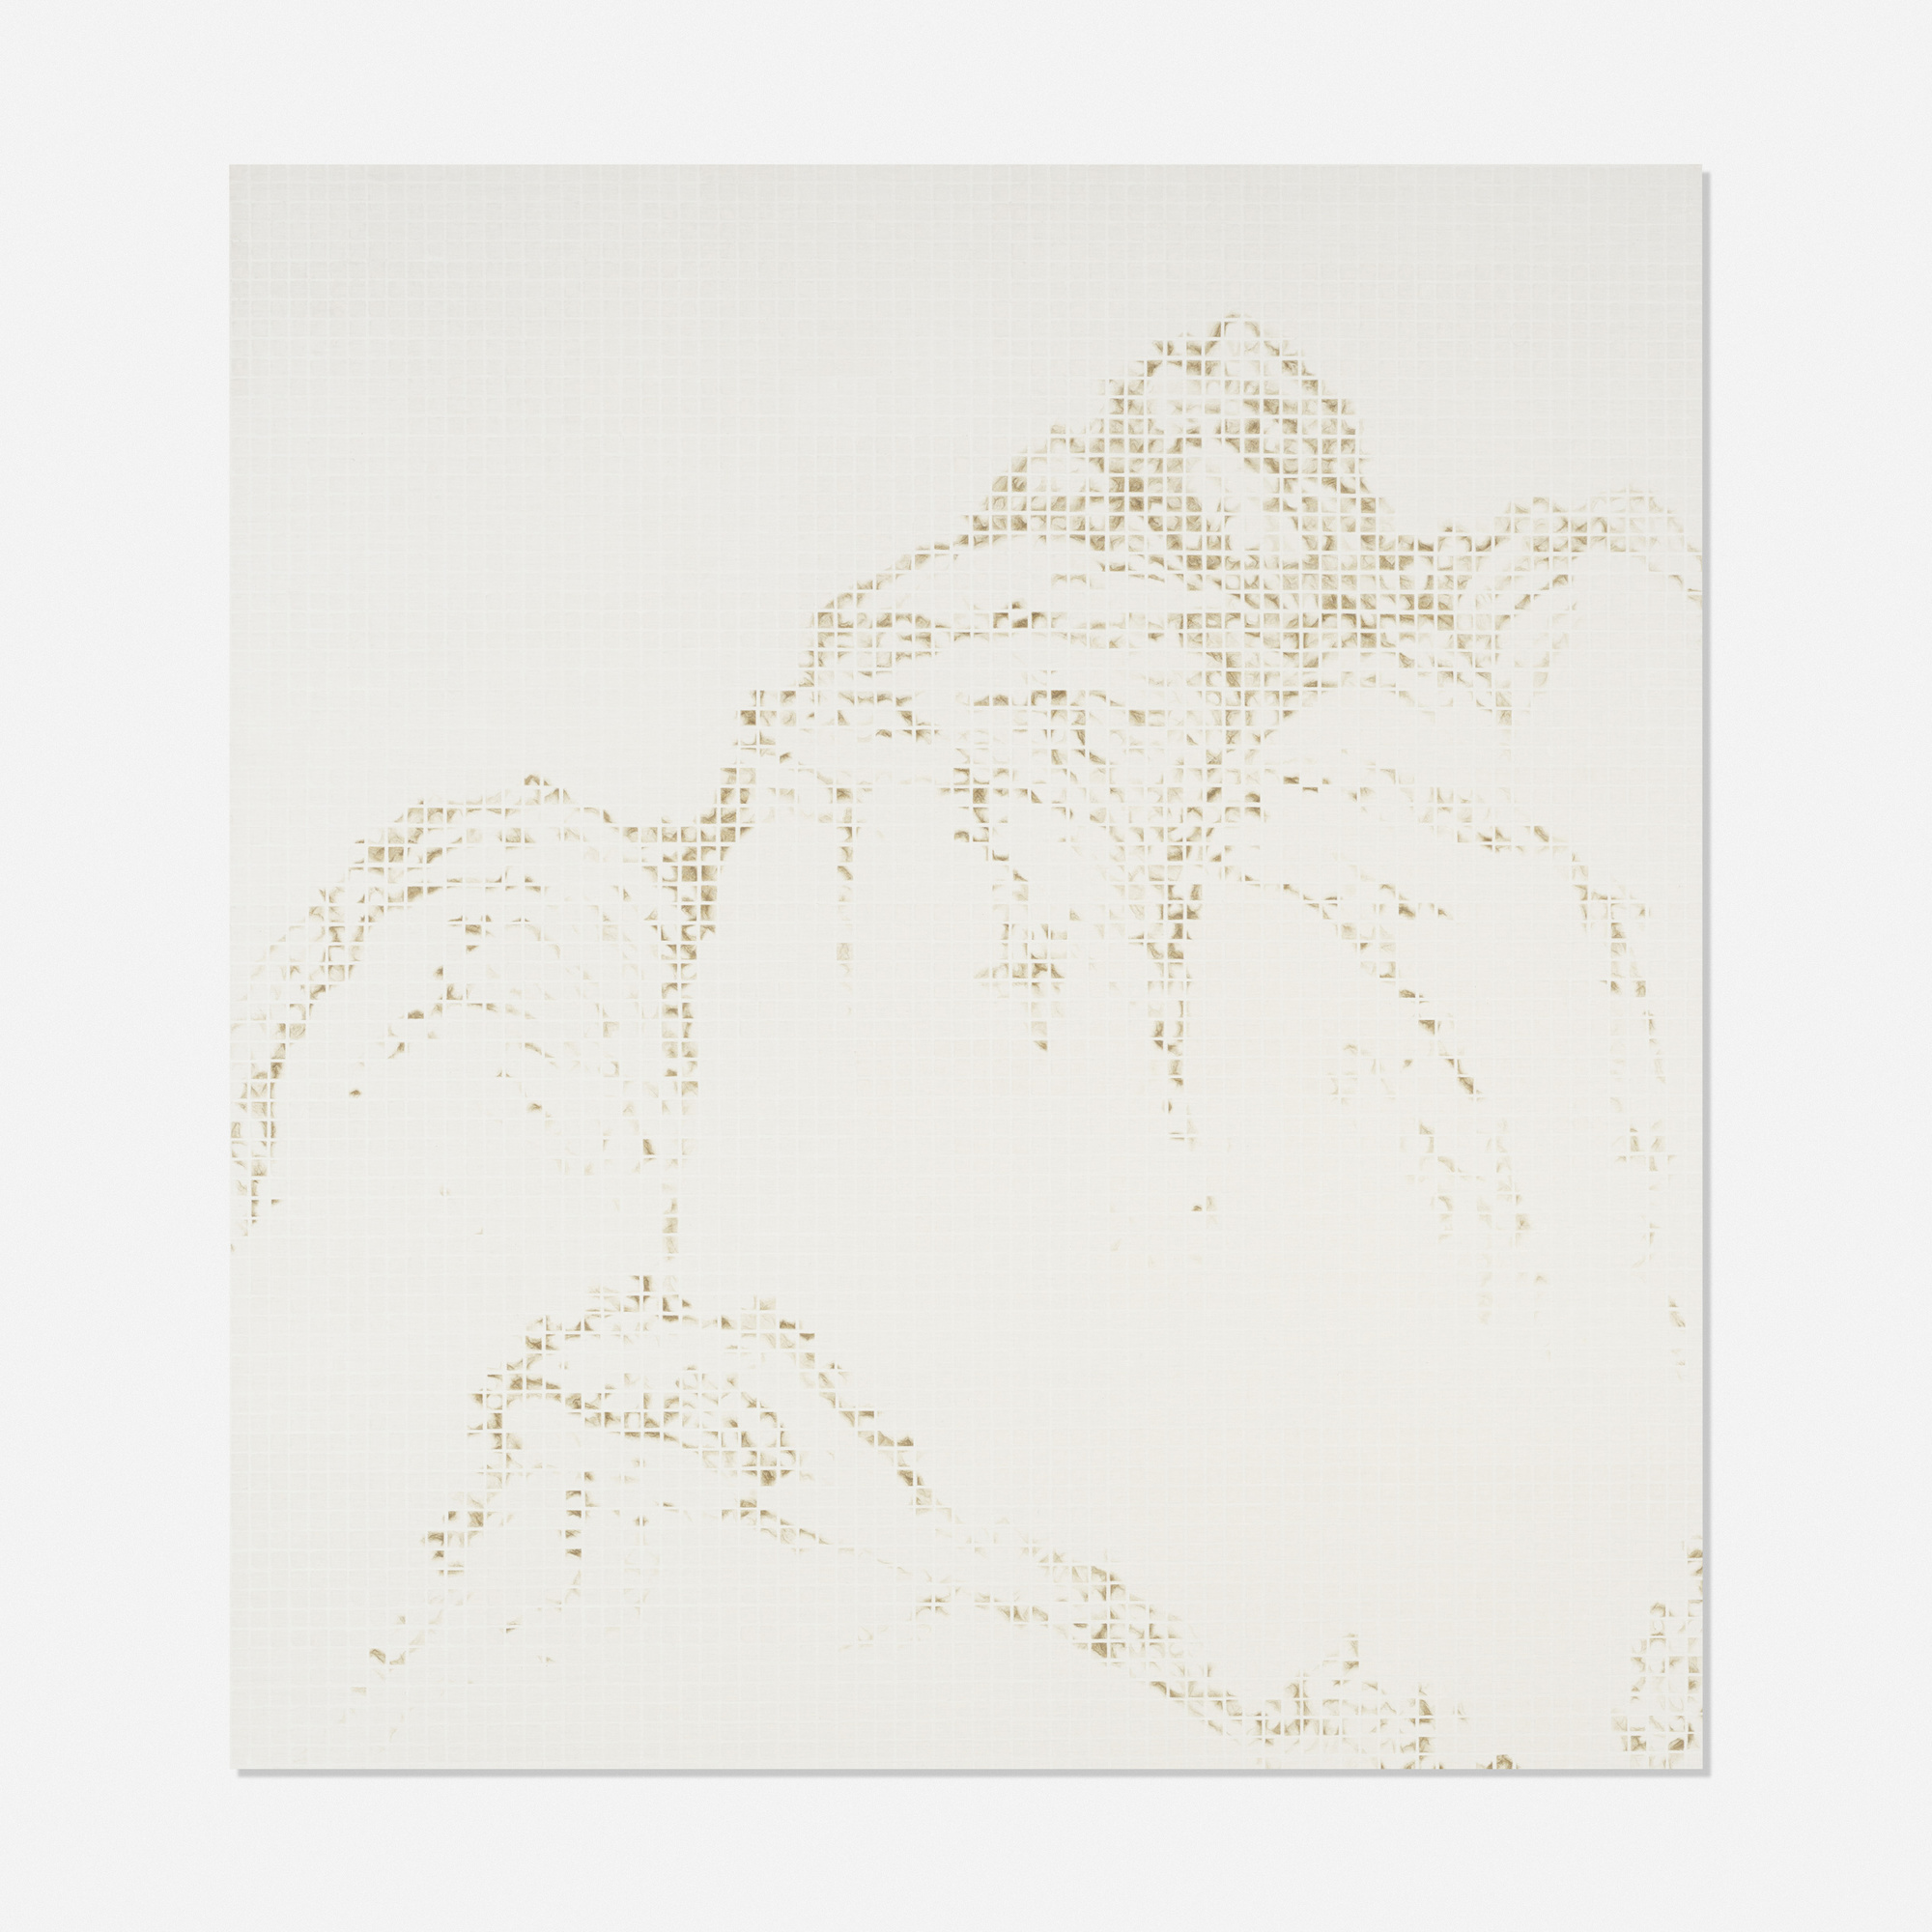 252: Jun Jun Hu / Mountain - Summer Solstice (1 of 1)